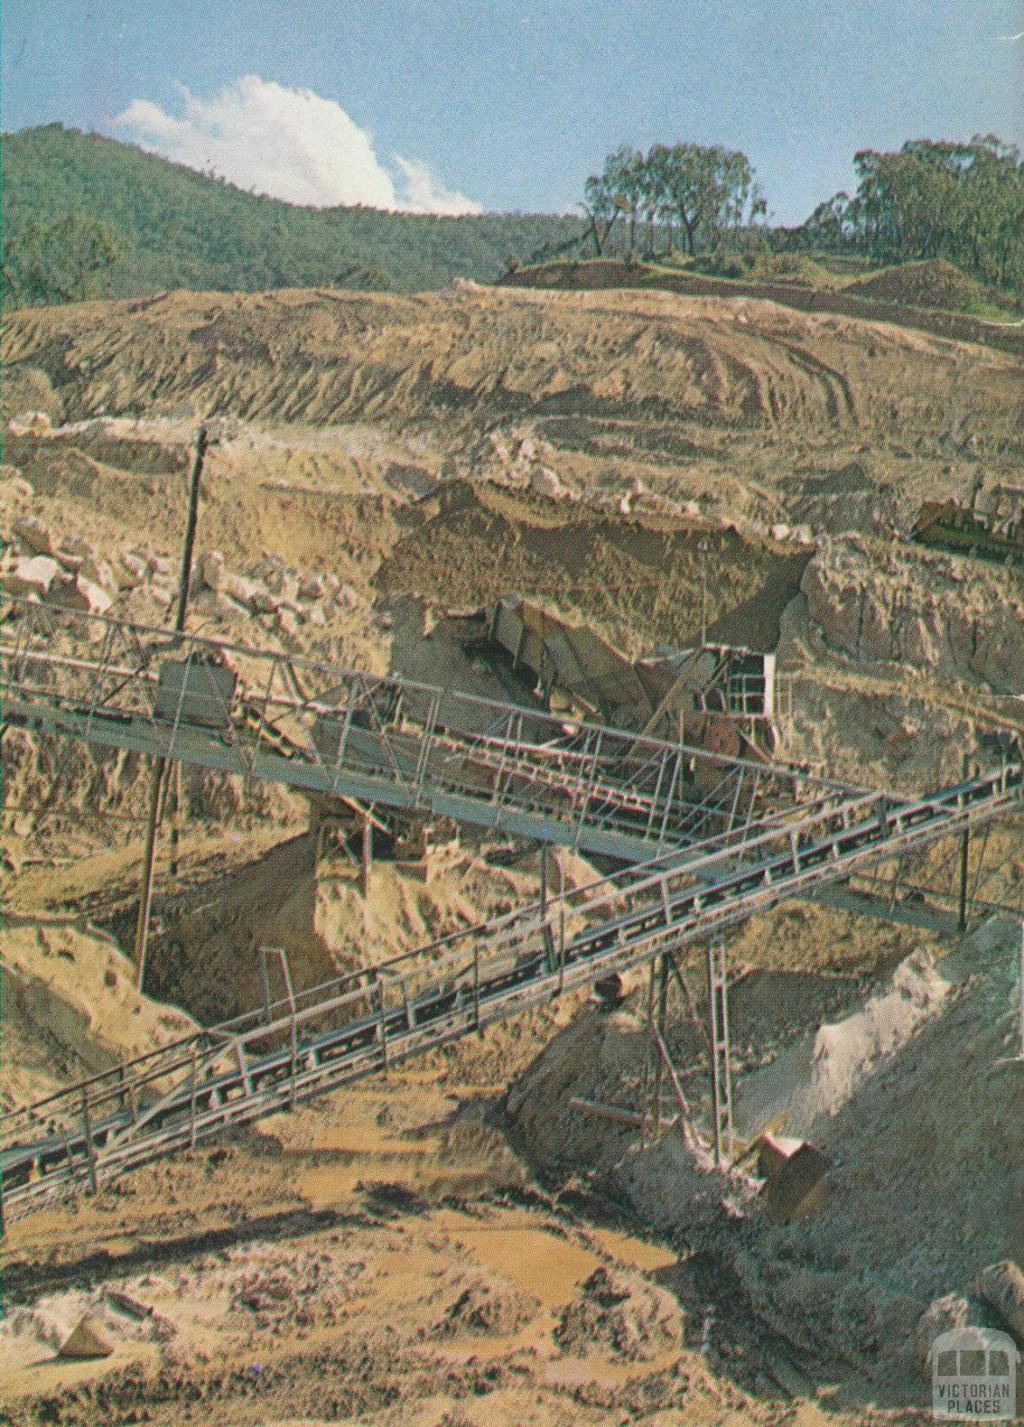 Open-cut tin mining operations, Walwa, 1970